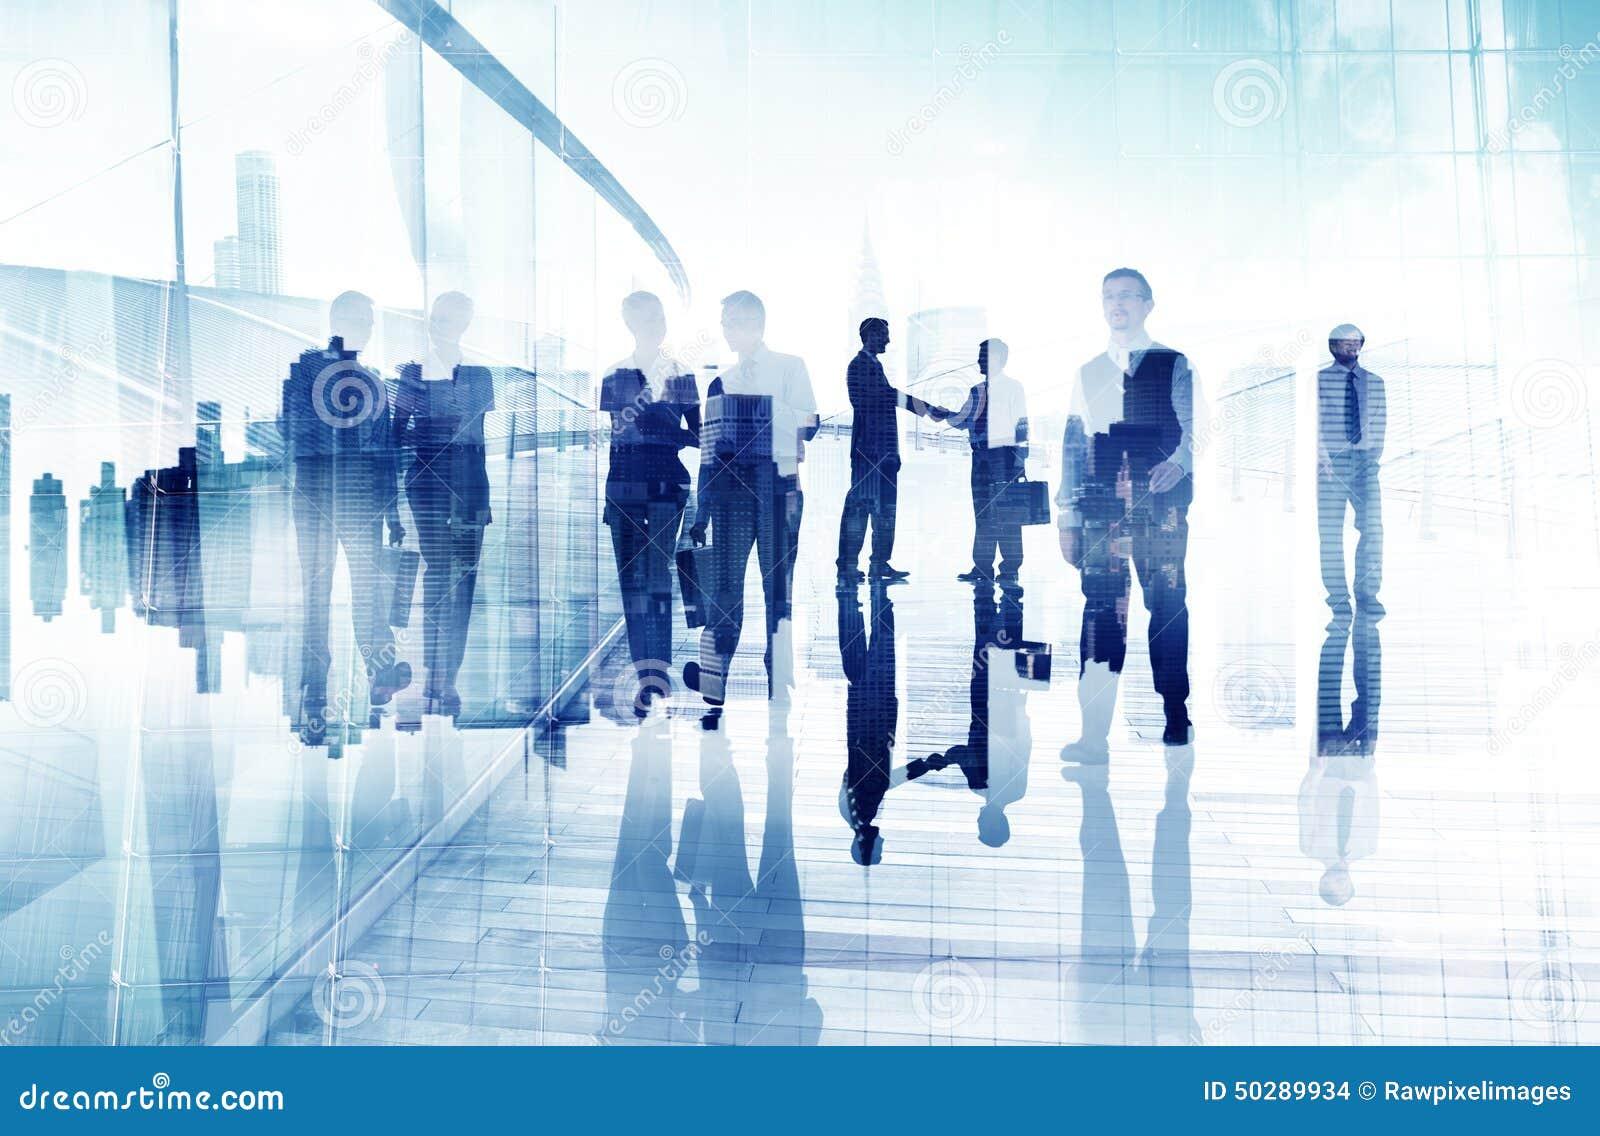 Business People Walking Handshake Professional Urban City Concept